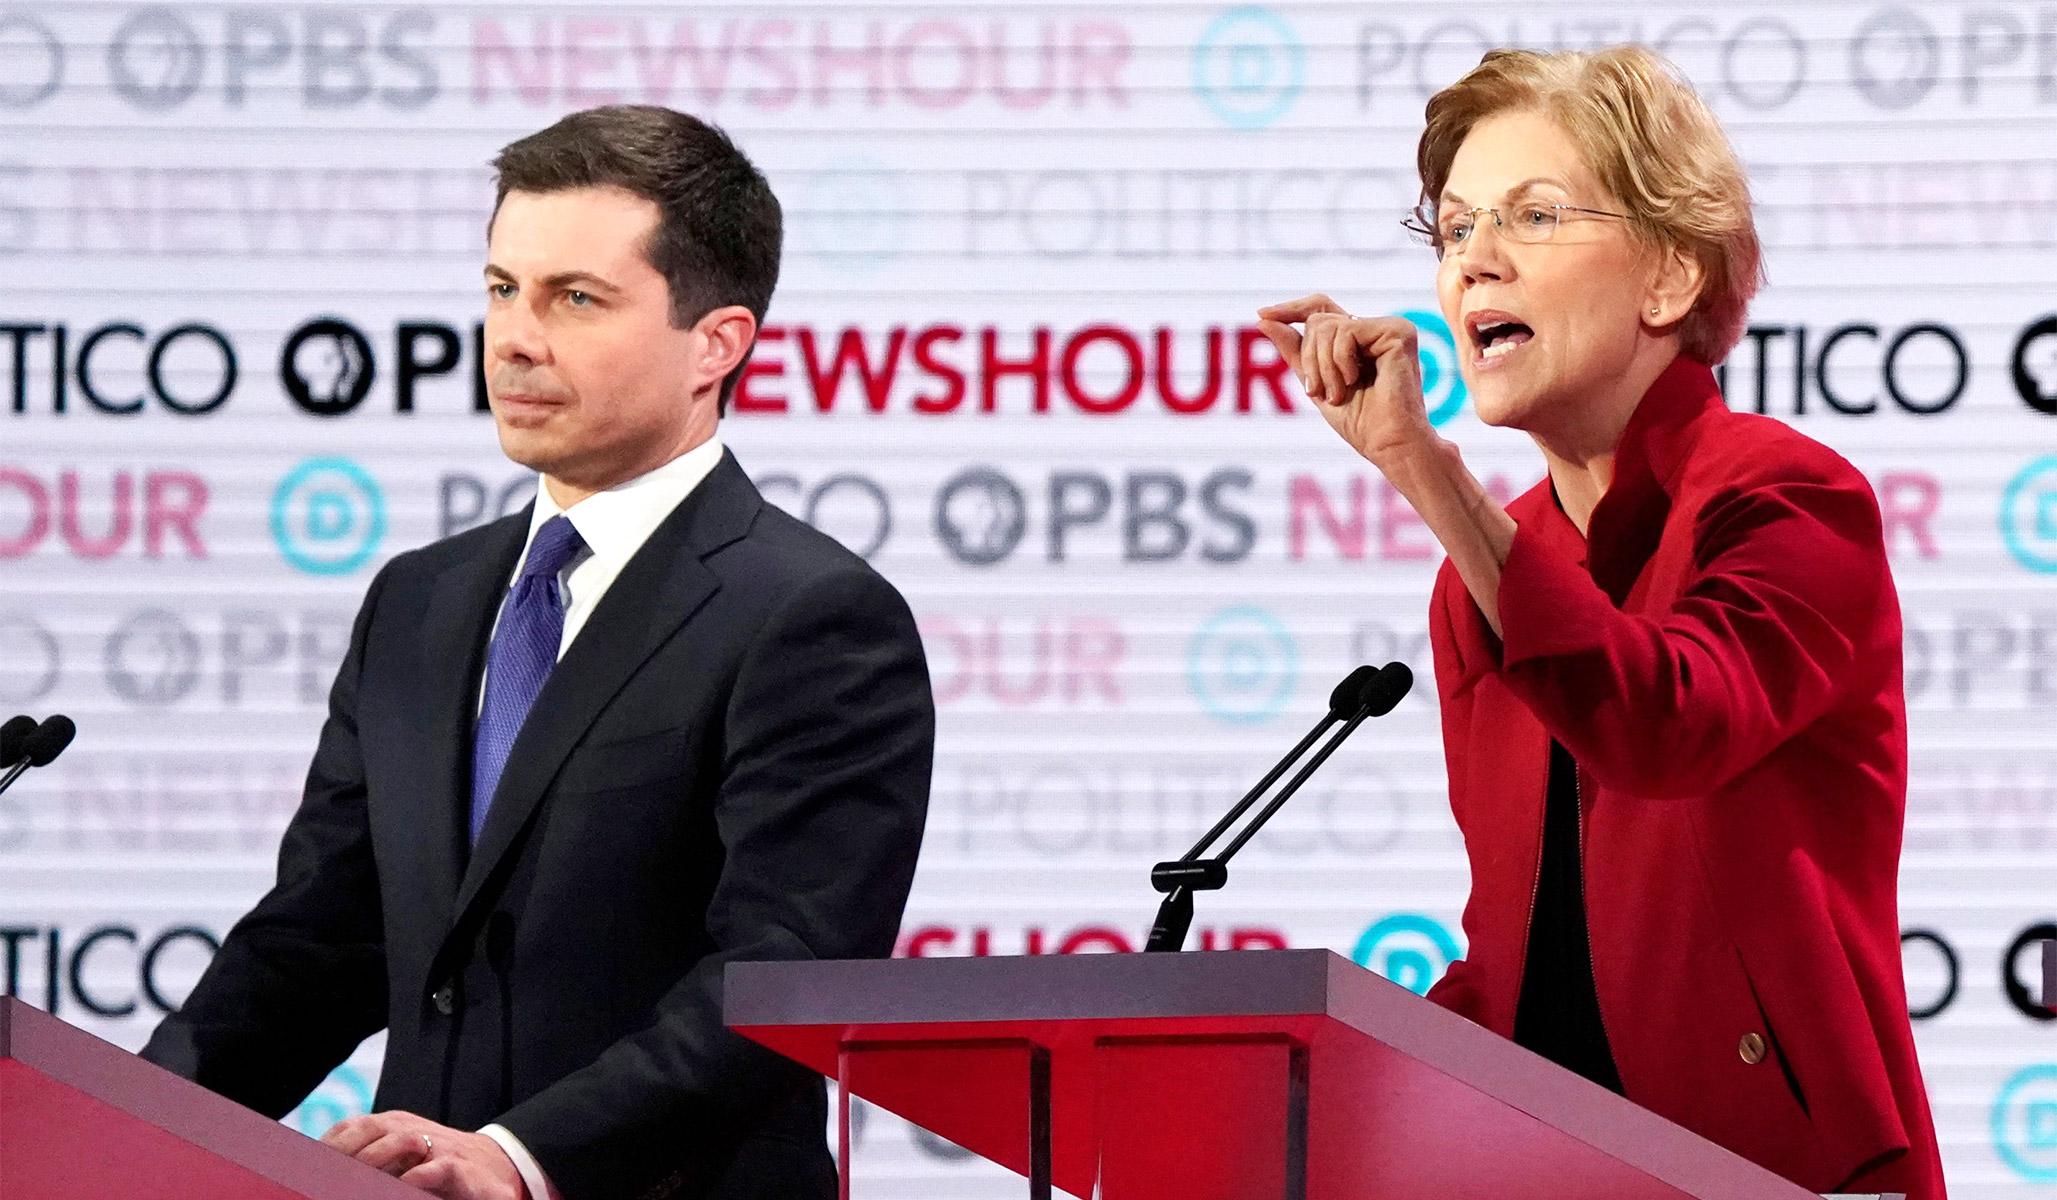 Biden Cruises and Buttigieg Takes Fire in the Wine Cave Debate